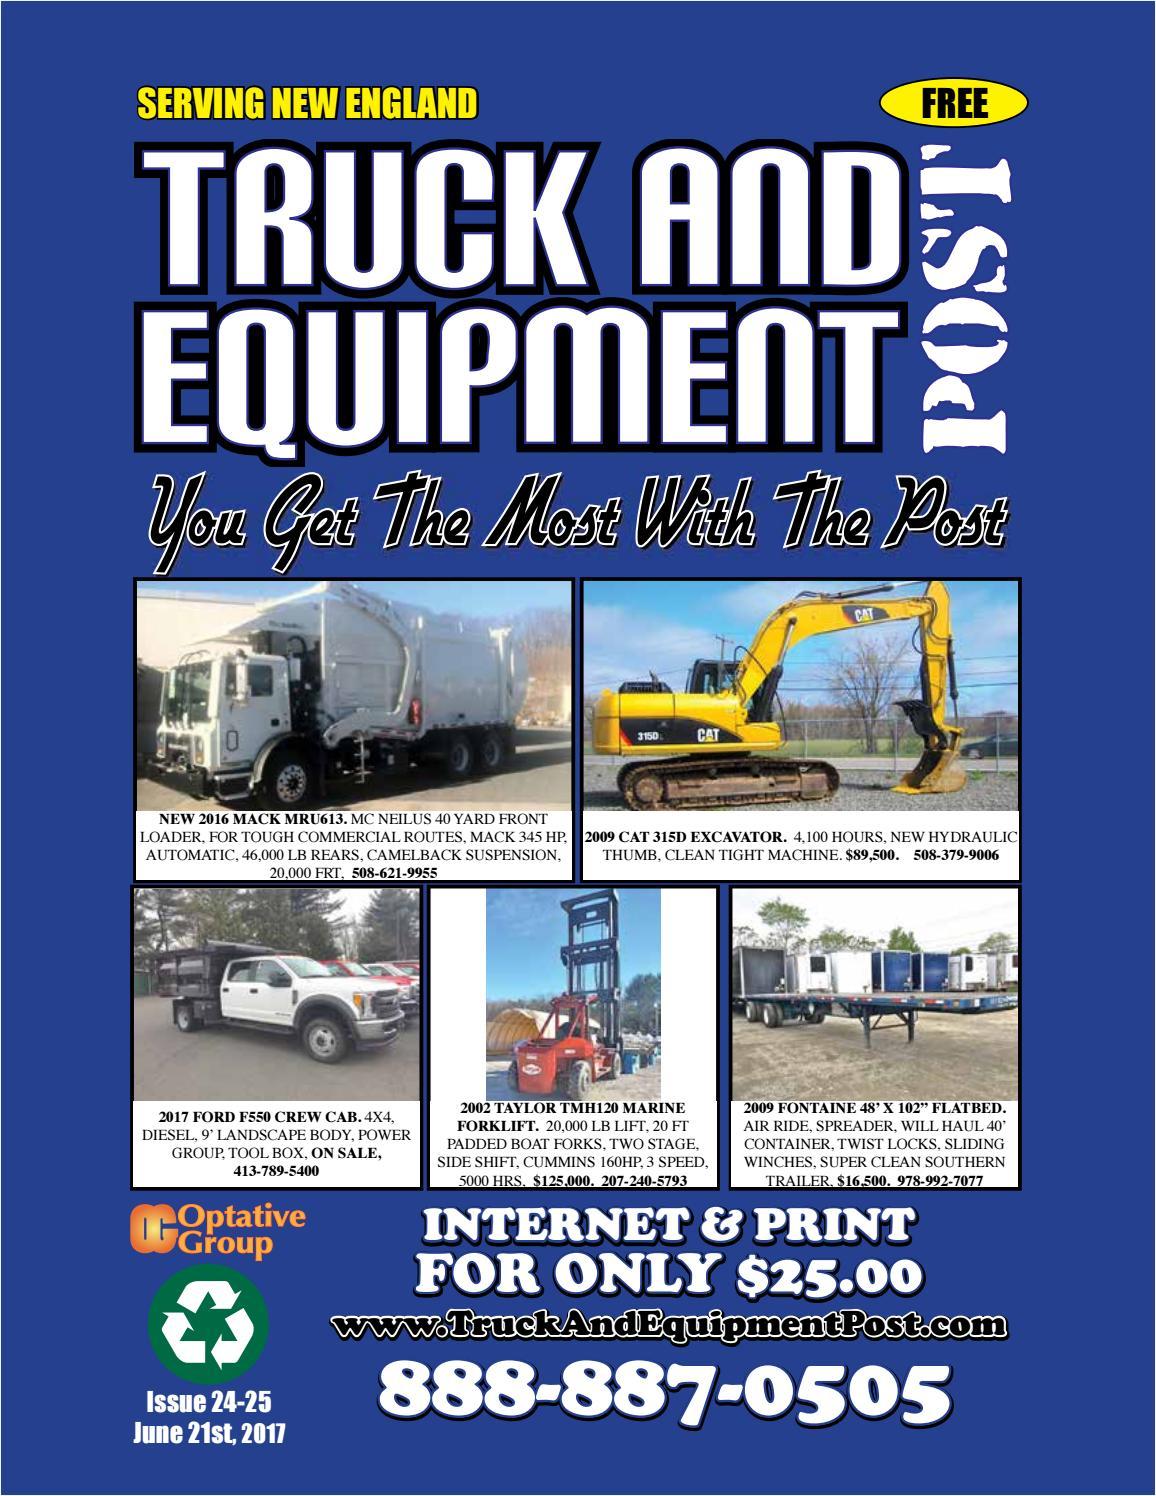 Truck equipment post 24 25 2017 by 1ClickAway - issuu